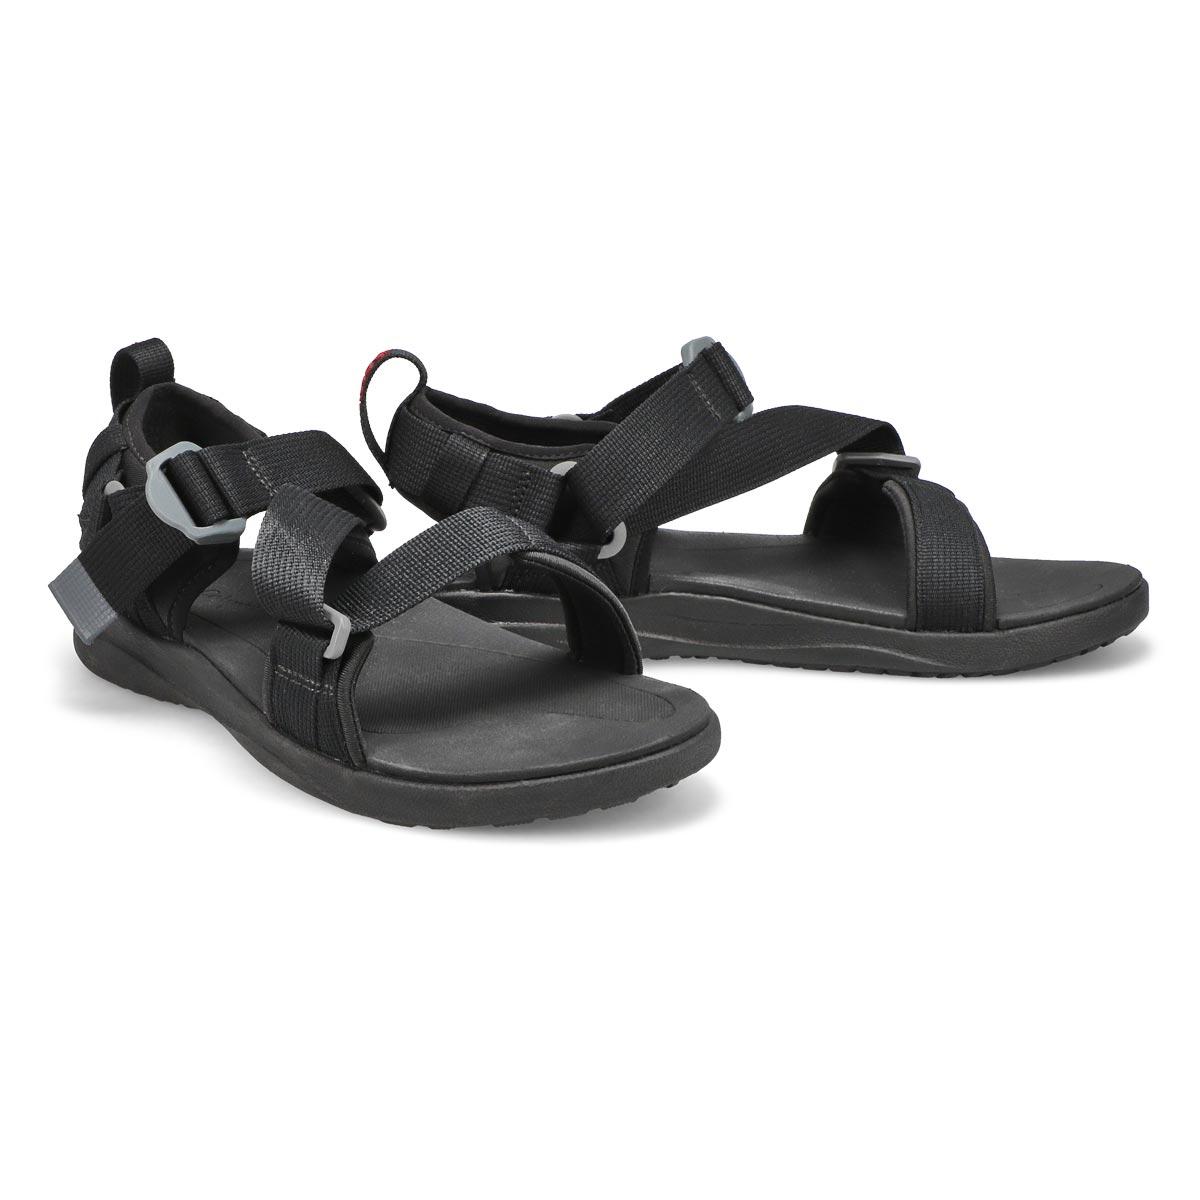 Men's Columbia Sport Sandal - Black/Red